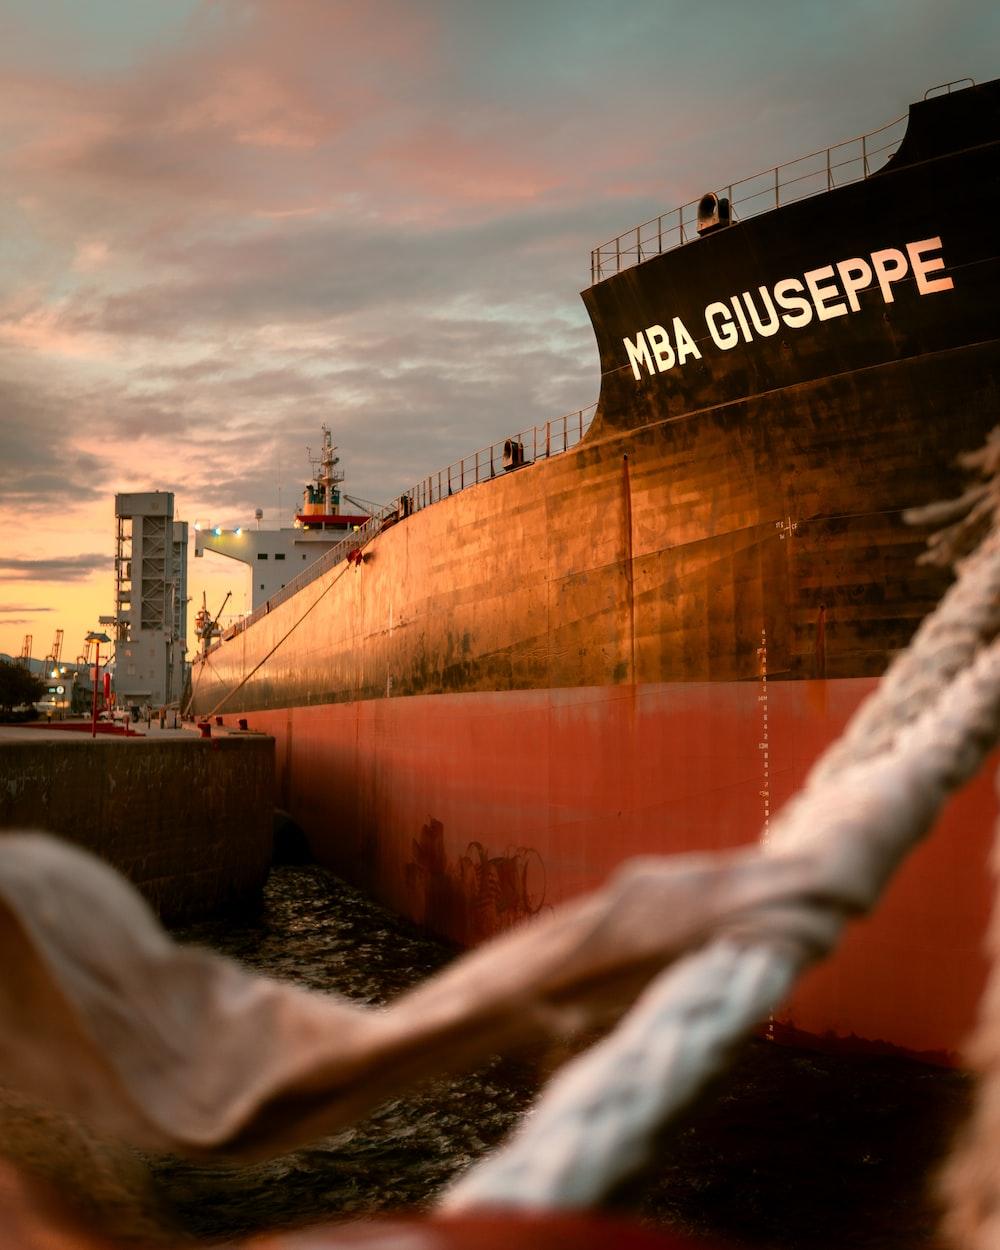 black ship on dock during sunset